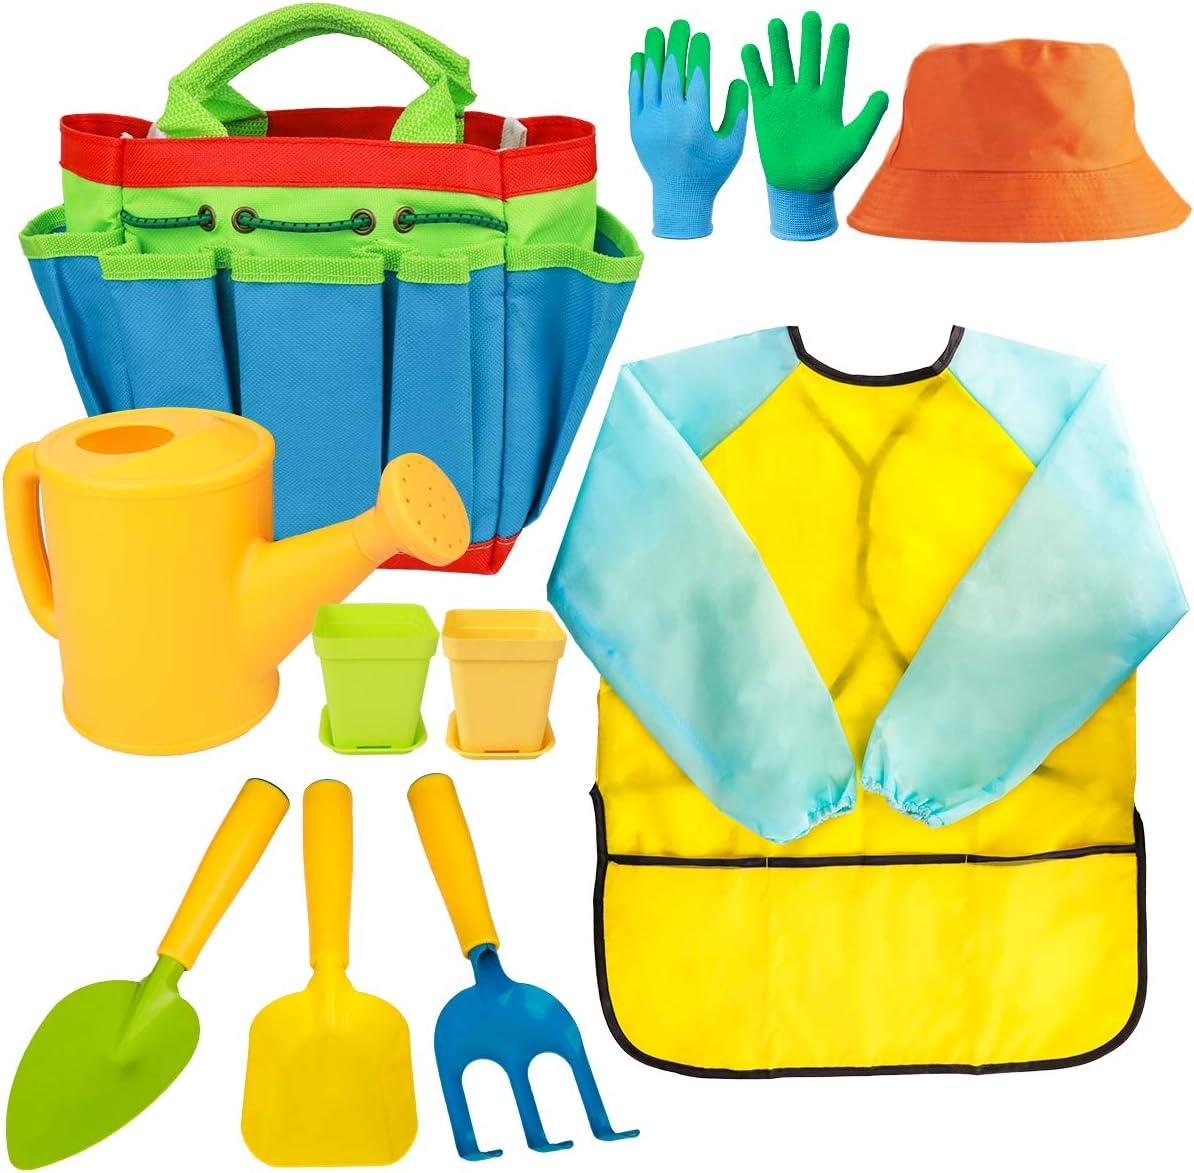 Meland Kids Gardening Tools - Toddler Garden Tools Set - Kids Metal, Shovel, Rake, Trowel in One Tote Bag with Watering Can, Gardening Gloves, Smock - Garden Toys Gift for Preschool Boys & Girls